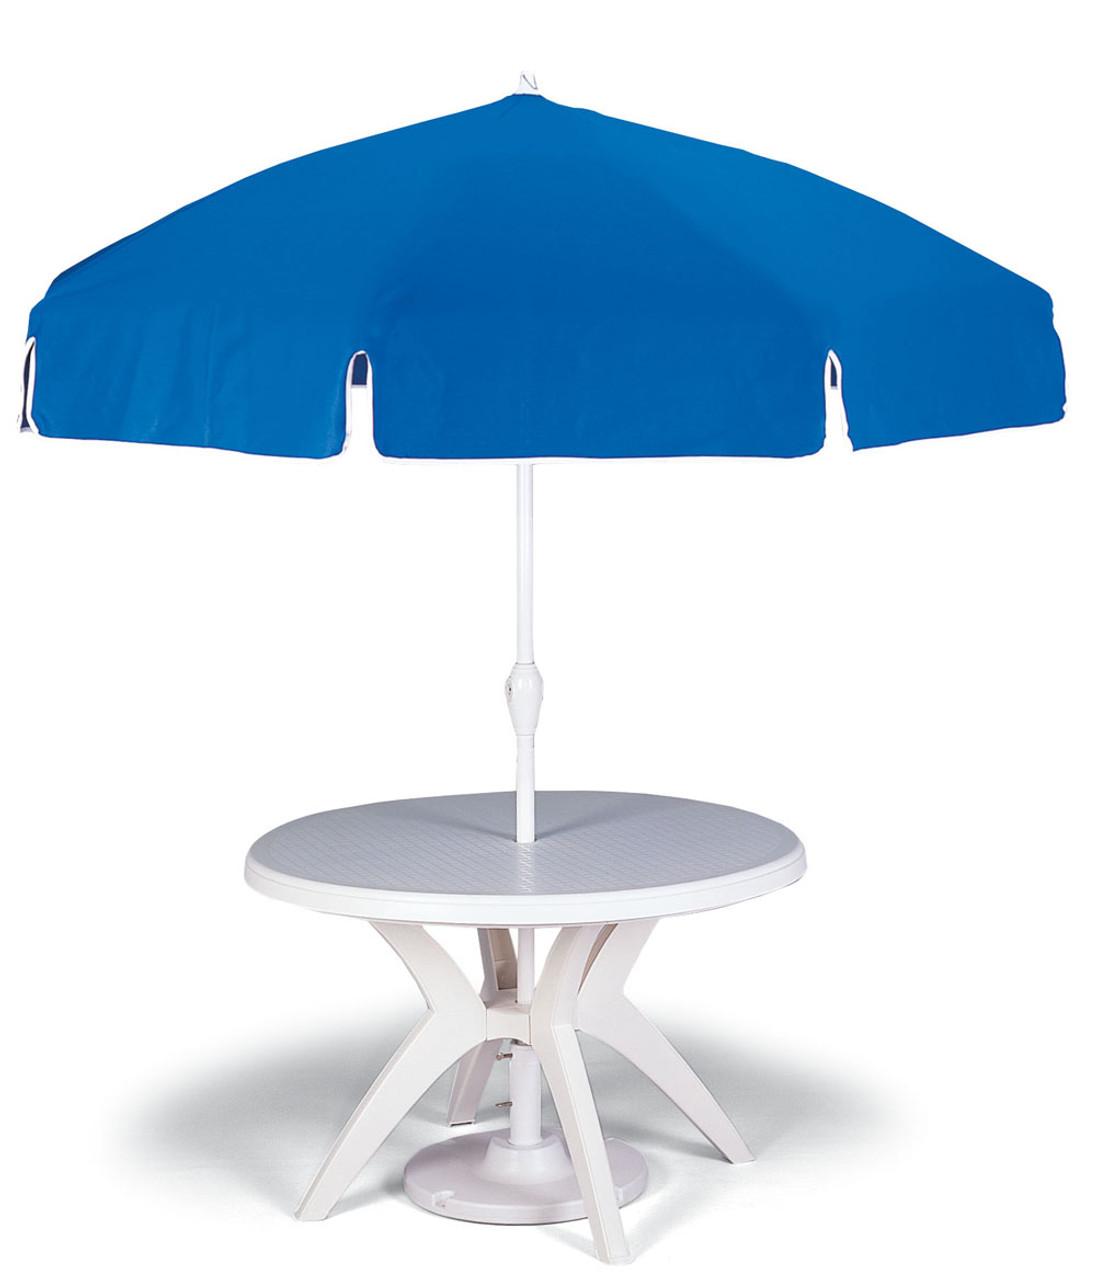 46 Round White Outdoor Resin Ibiza Restaurant Pedestal Table With Umbrella Hole Grosfillex